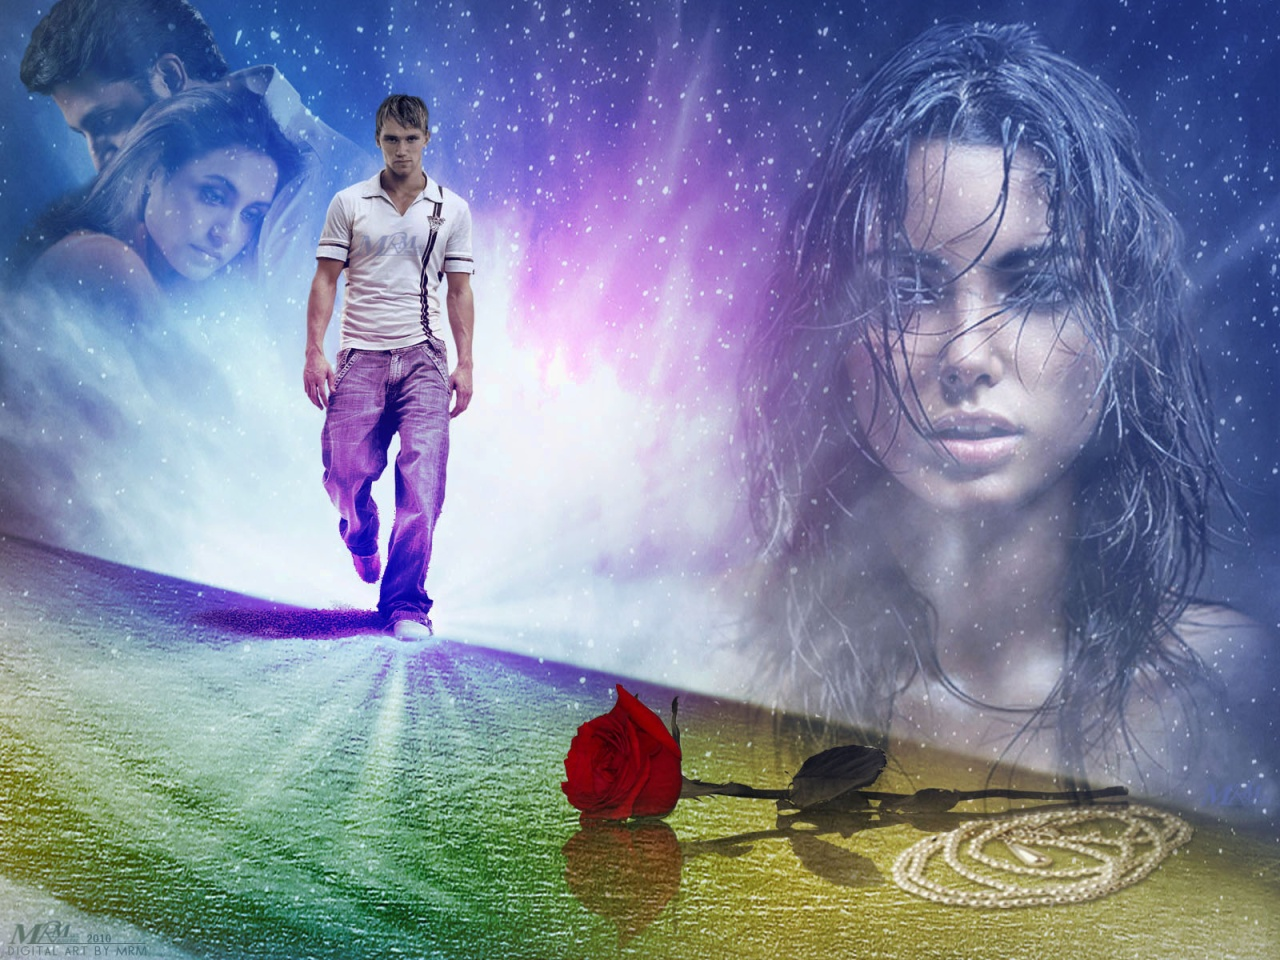 lamenik: fantasy art love